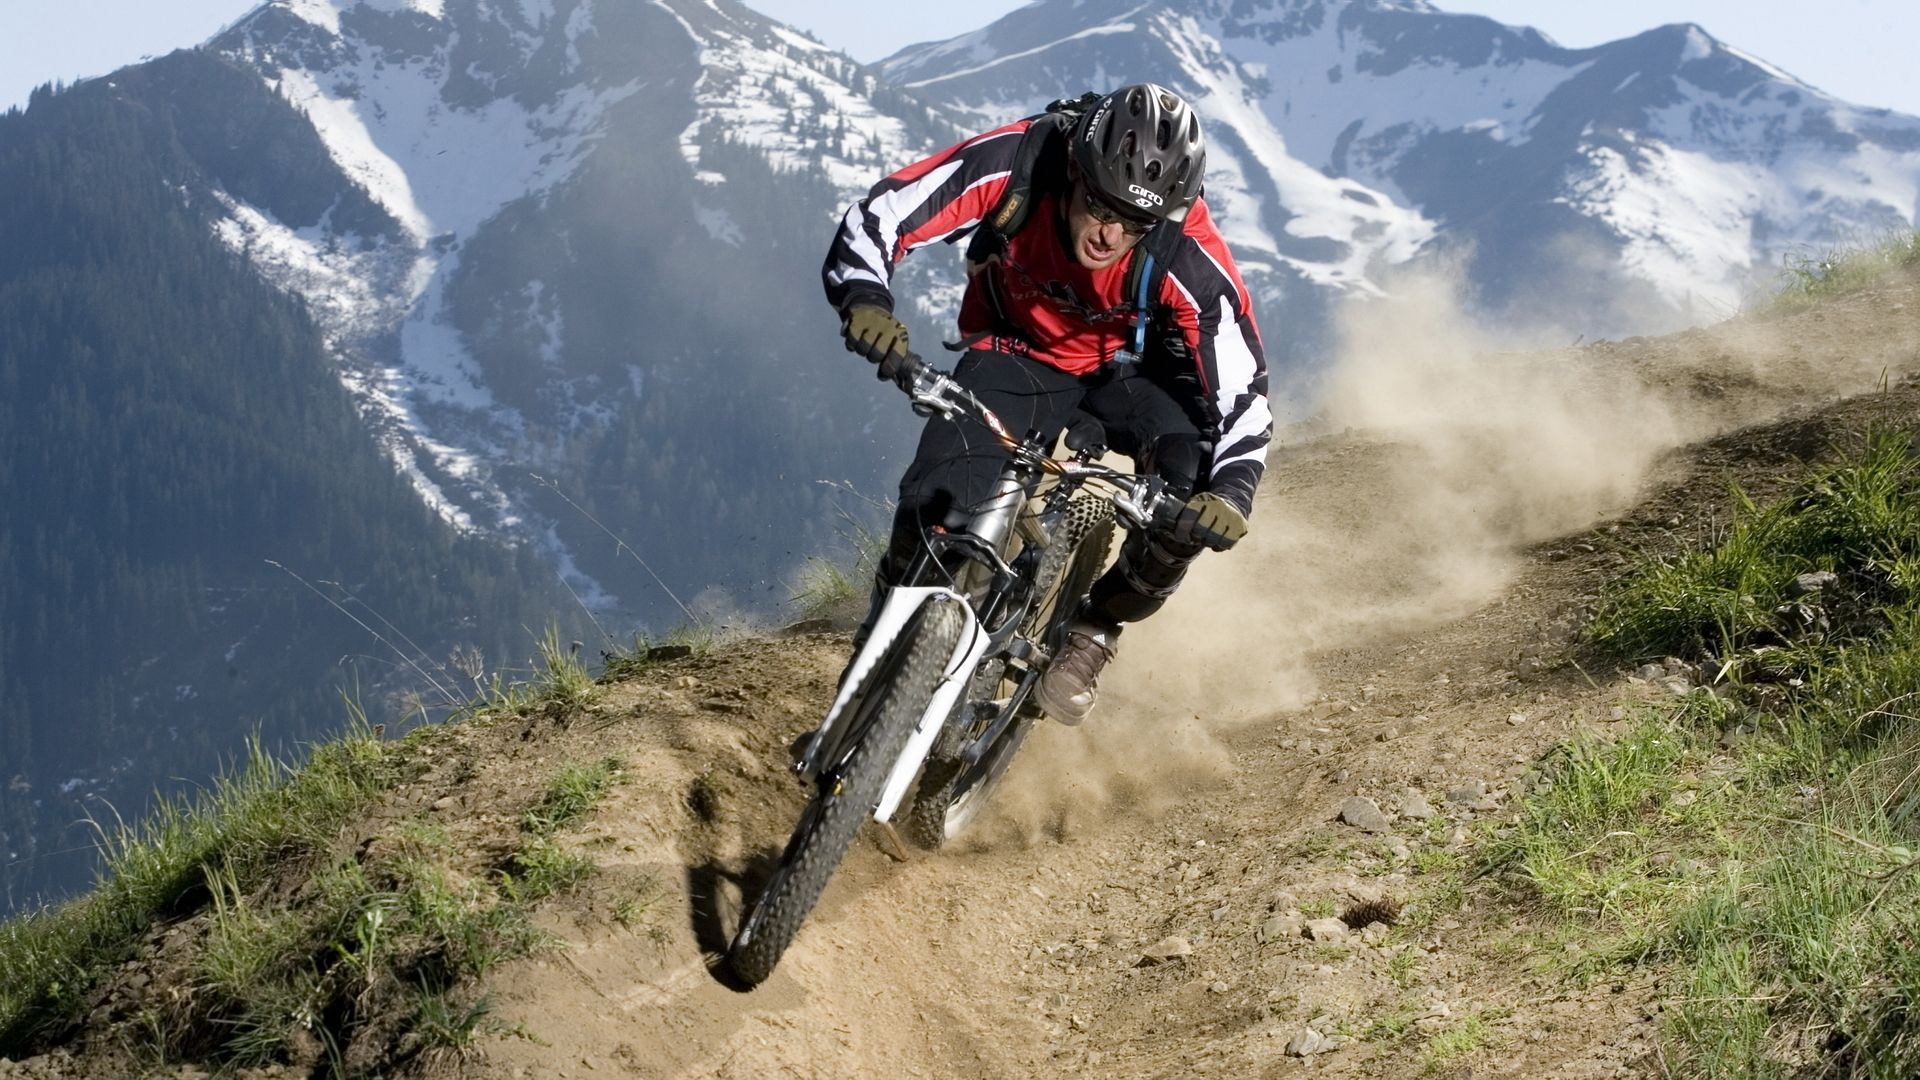 Mountain Bike full hd 1080p wallpaper